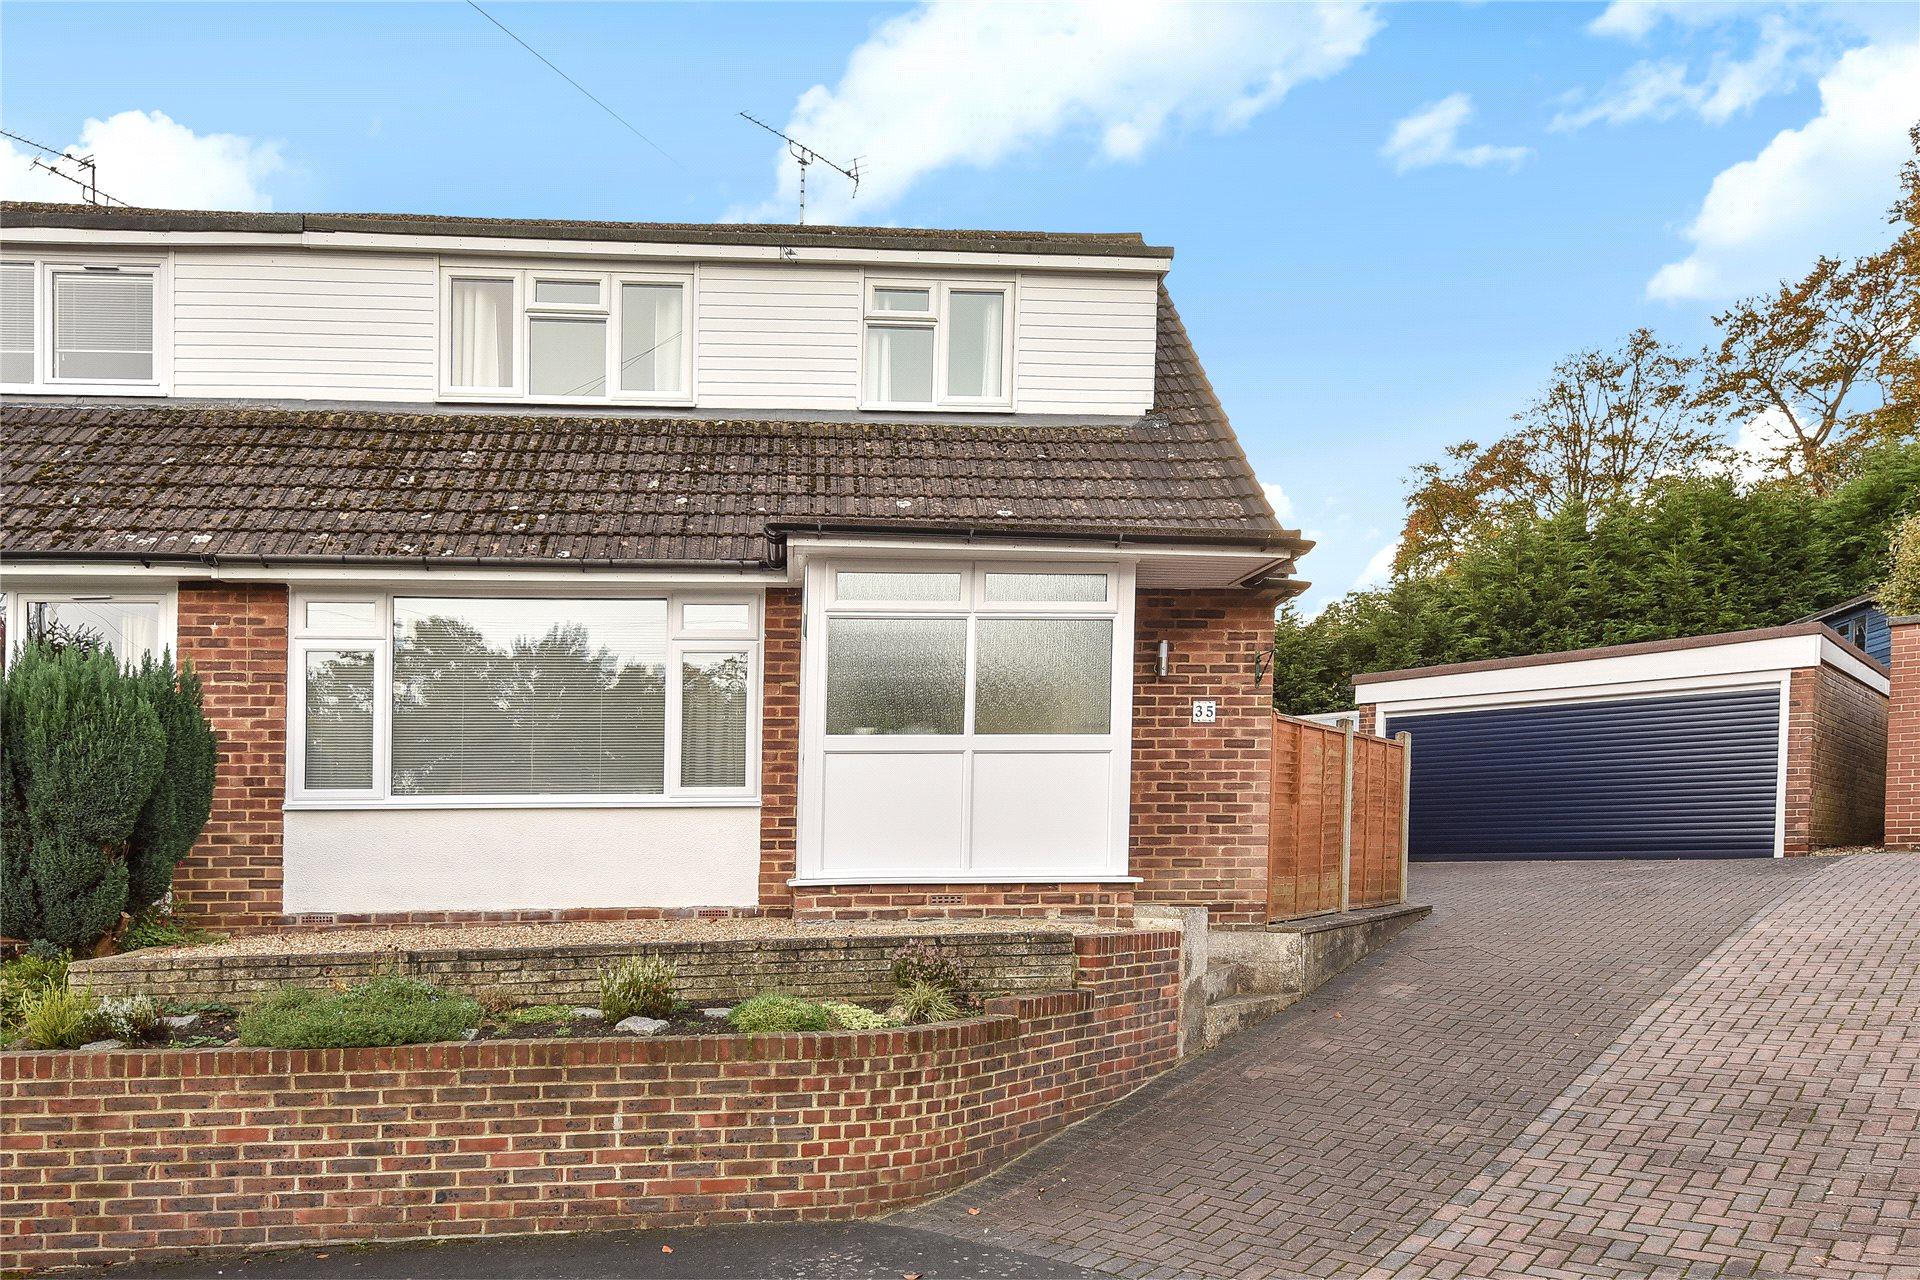 4 Bedrooms Semi Detached House for sale in Harts Leap Close, Sandhurst, Berkshire, GU47